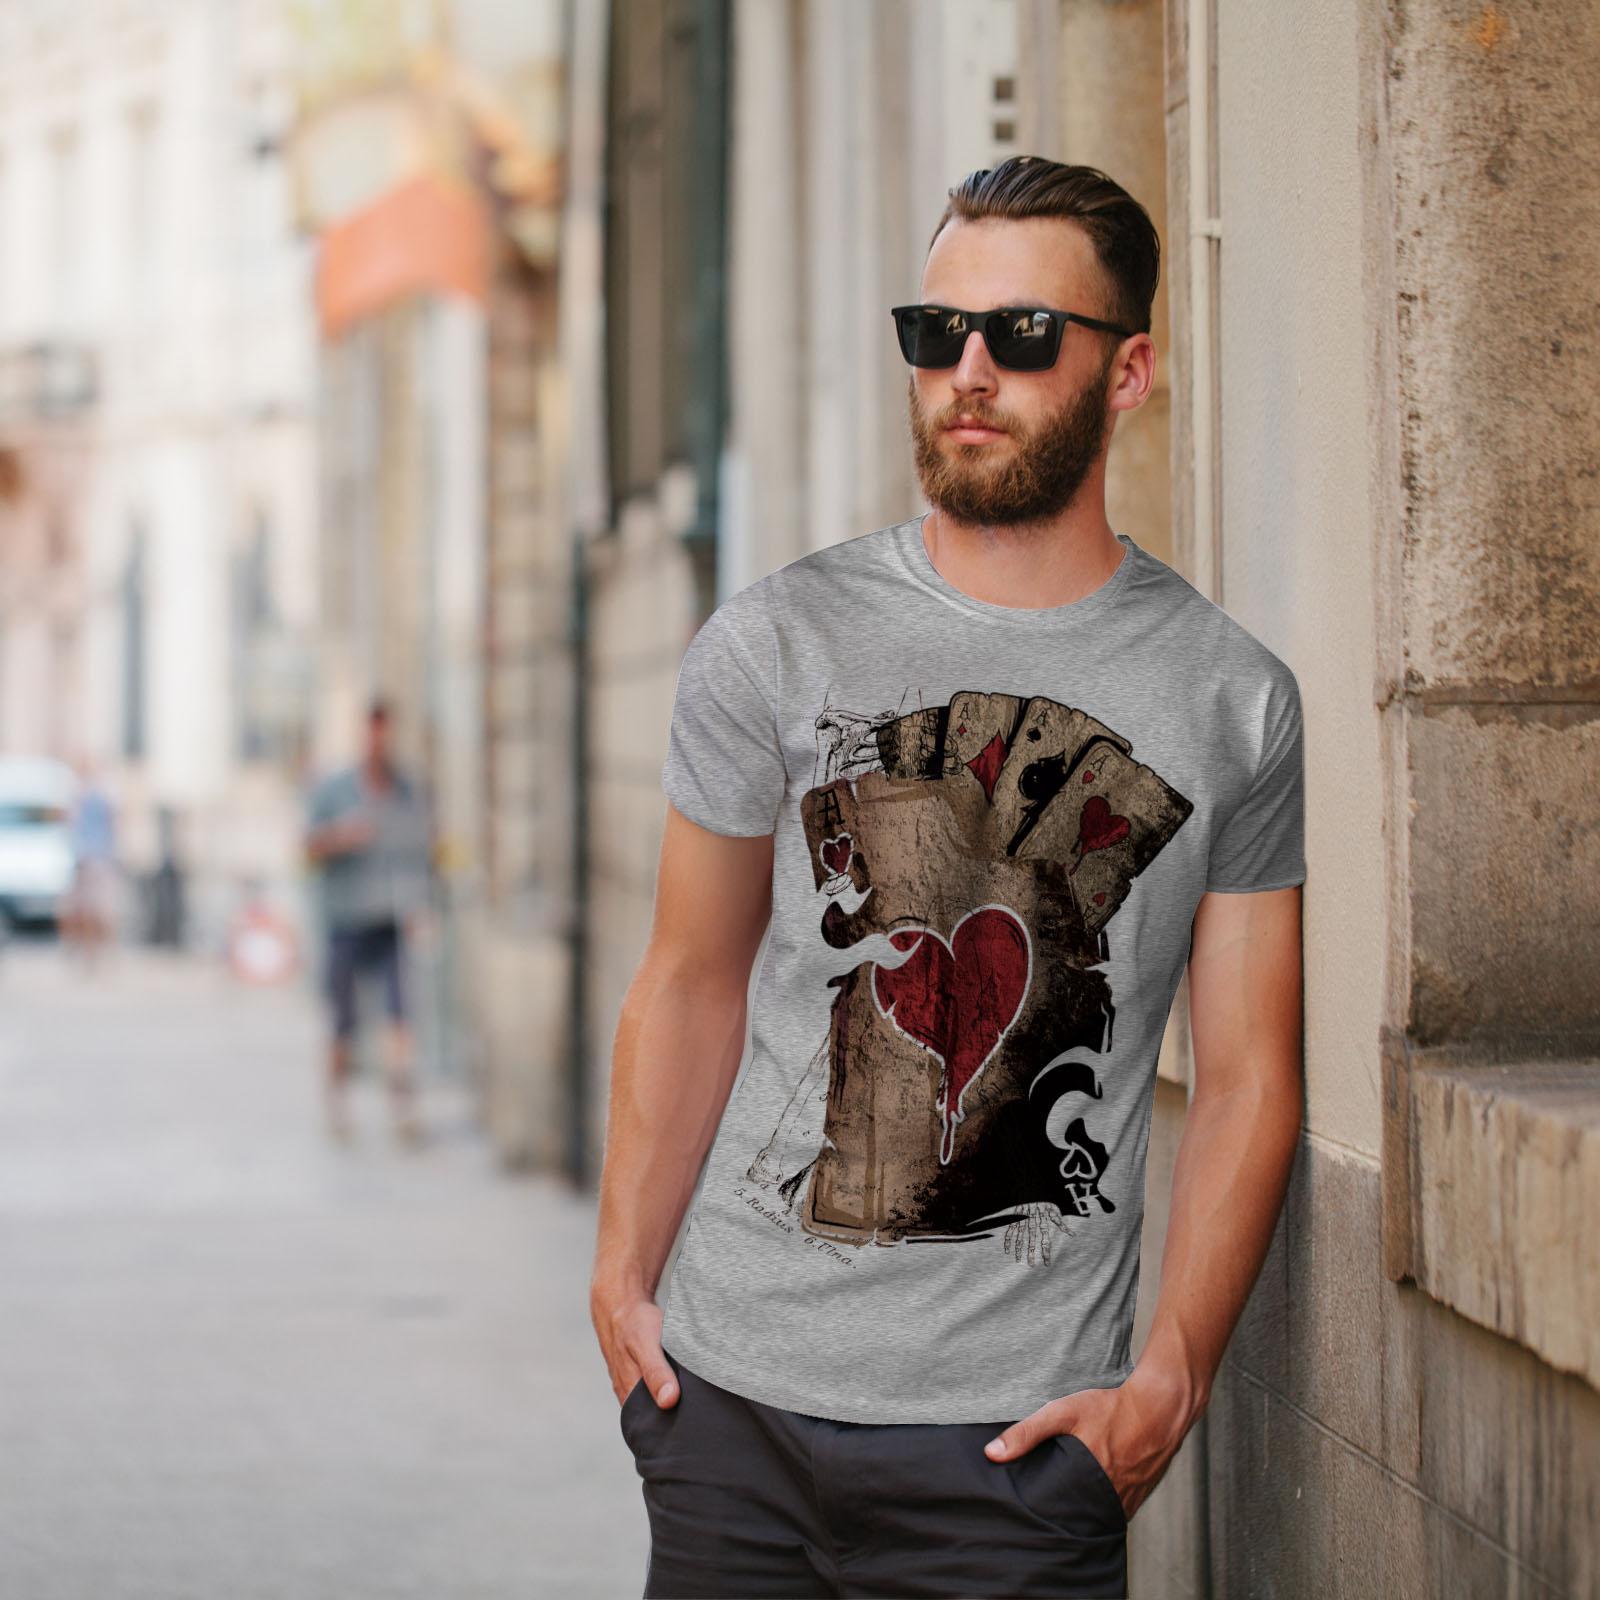 Wellcoda-Poker-Gamble-Squelette-T-shirt-homme-effrayant-conception-graphique-imprime-Tee miniature 17